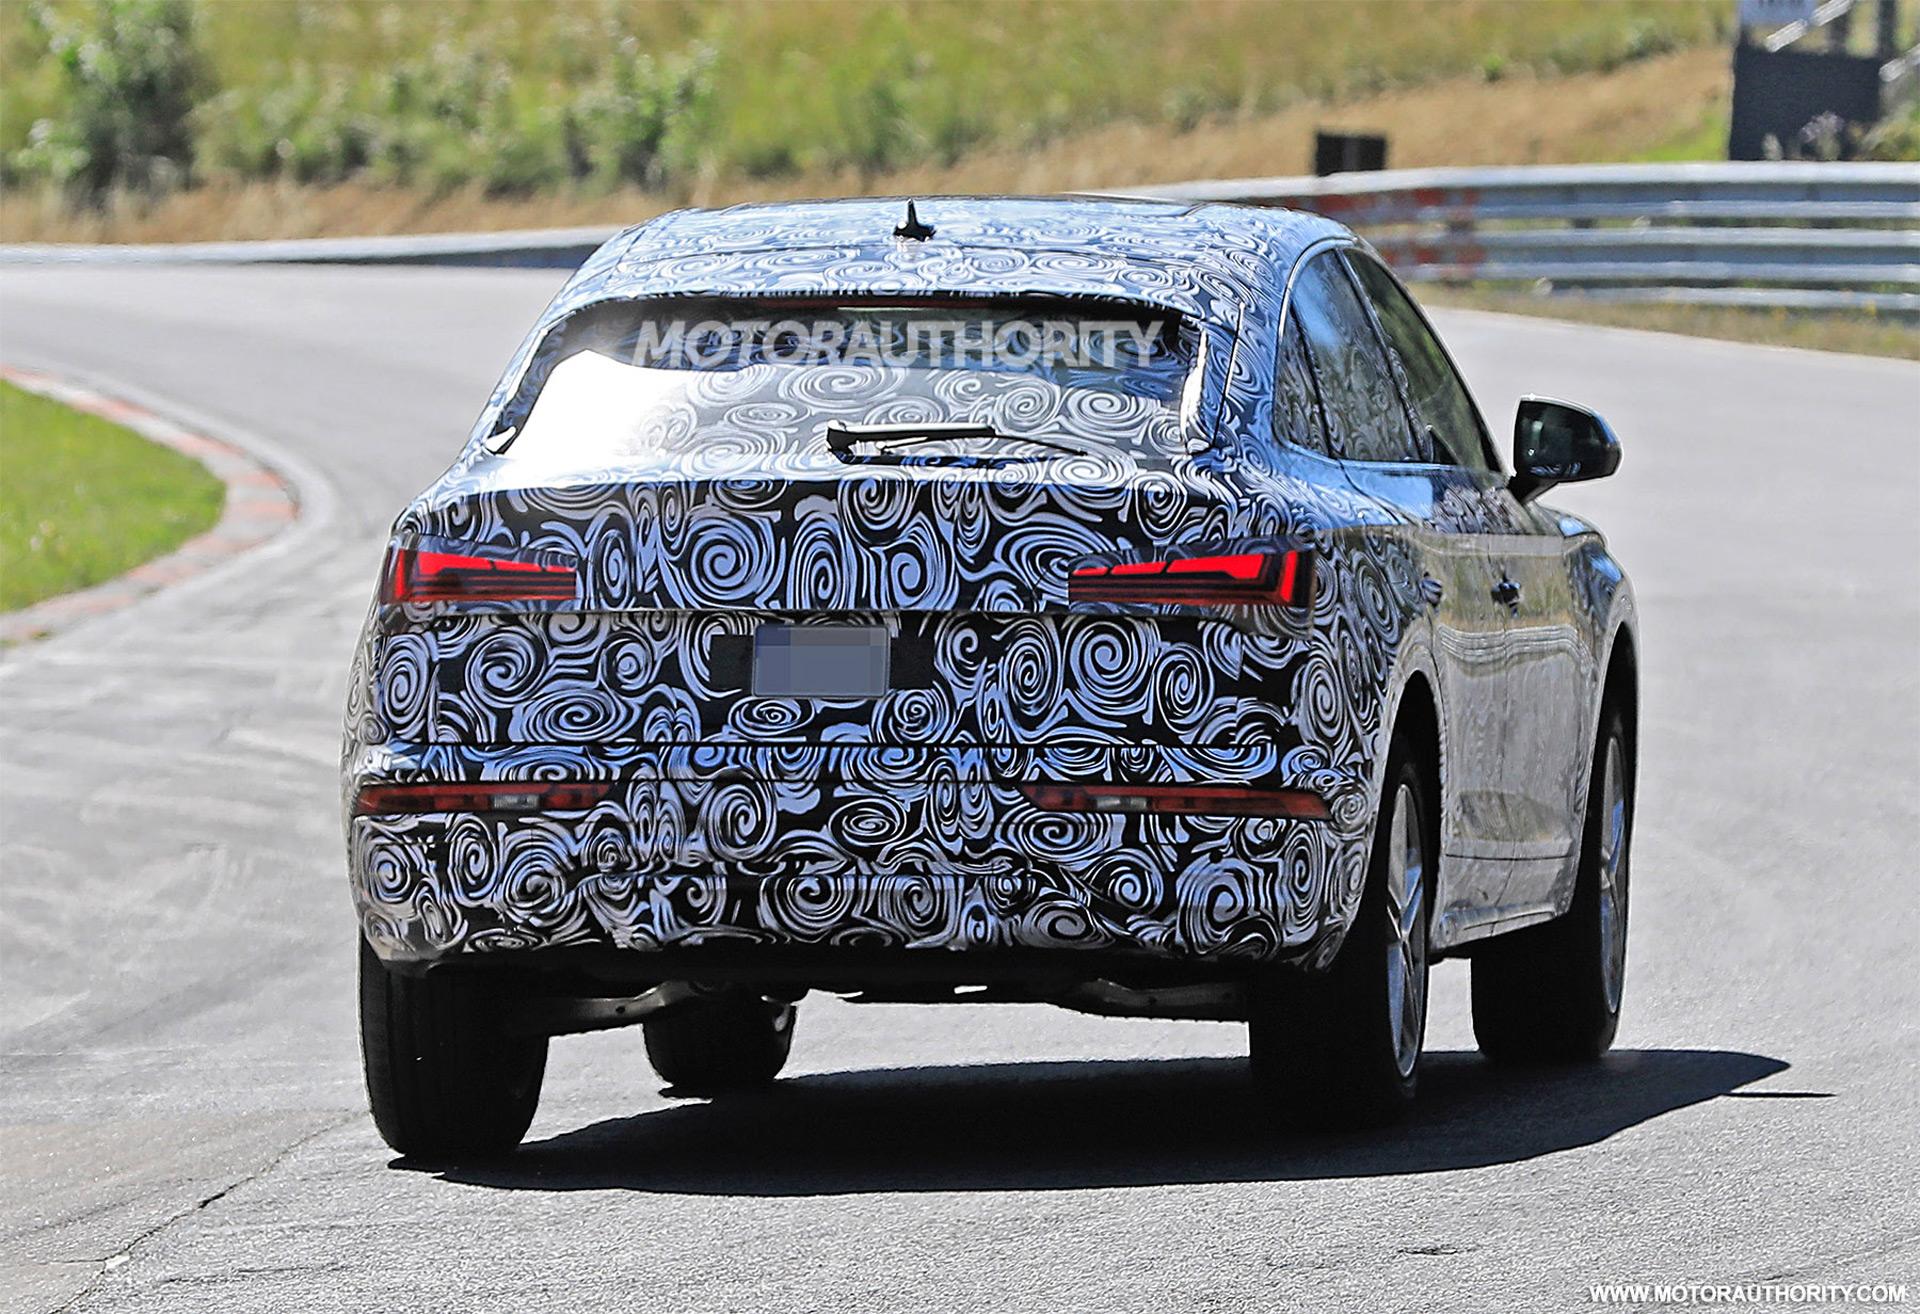 2020 - [Audi] Q5 Sportback - Page 7 2021-audi-q5-sportback-spy-shots--picture-credits-baldauf-sb-medien_100753275_h